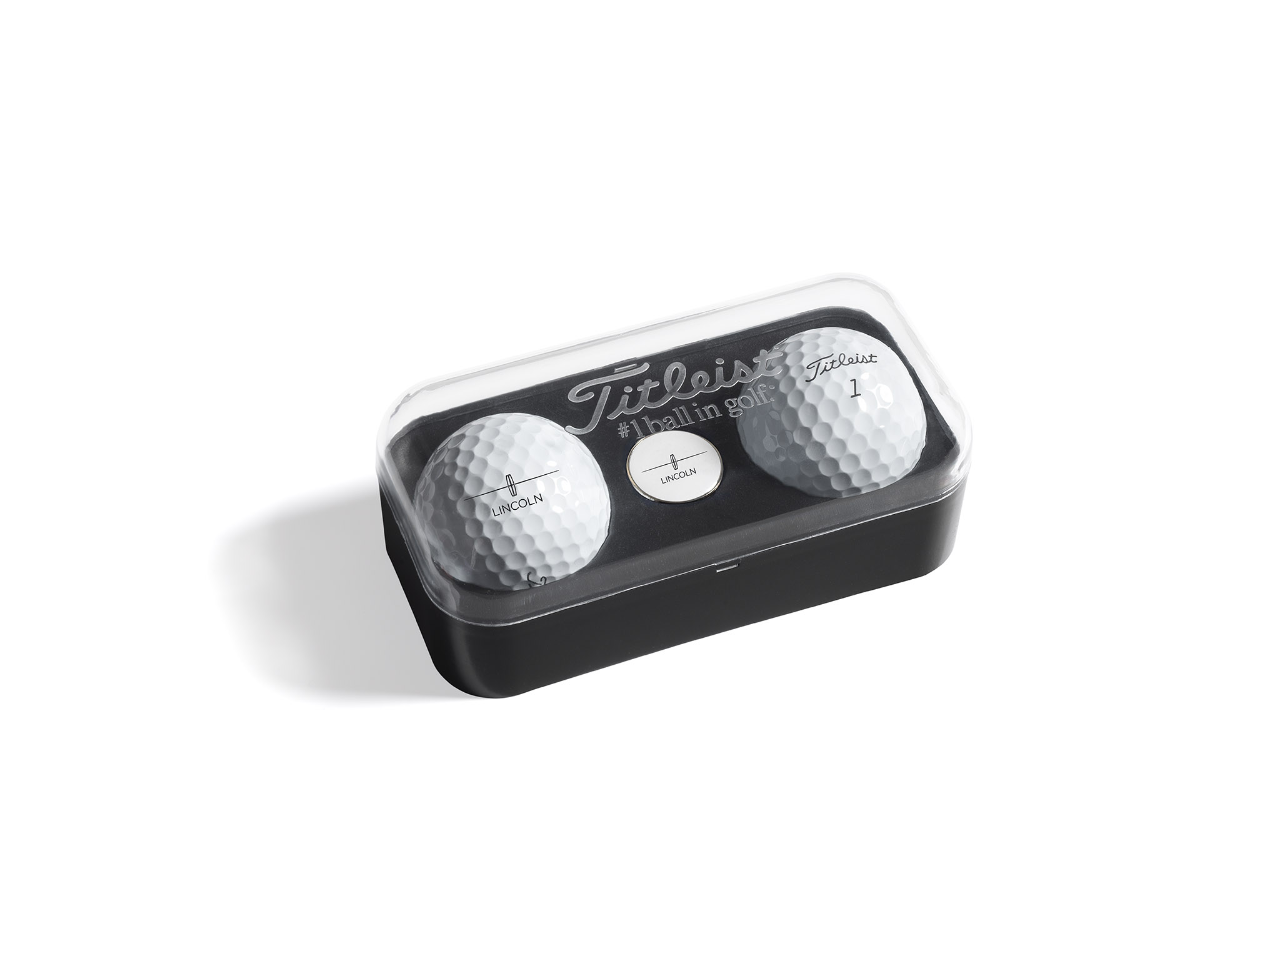 Titleist Two-Ball Marker Pack - Pro V1x Golf Balls